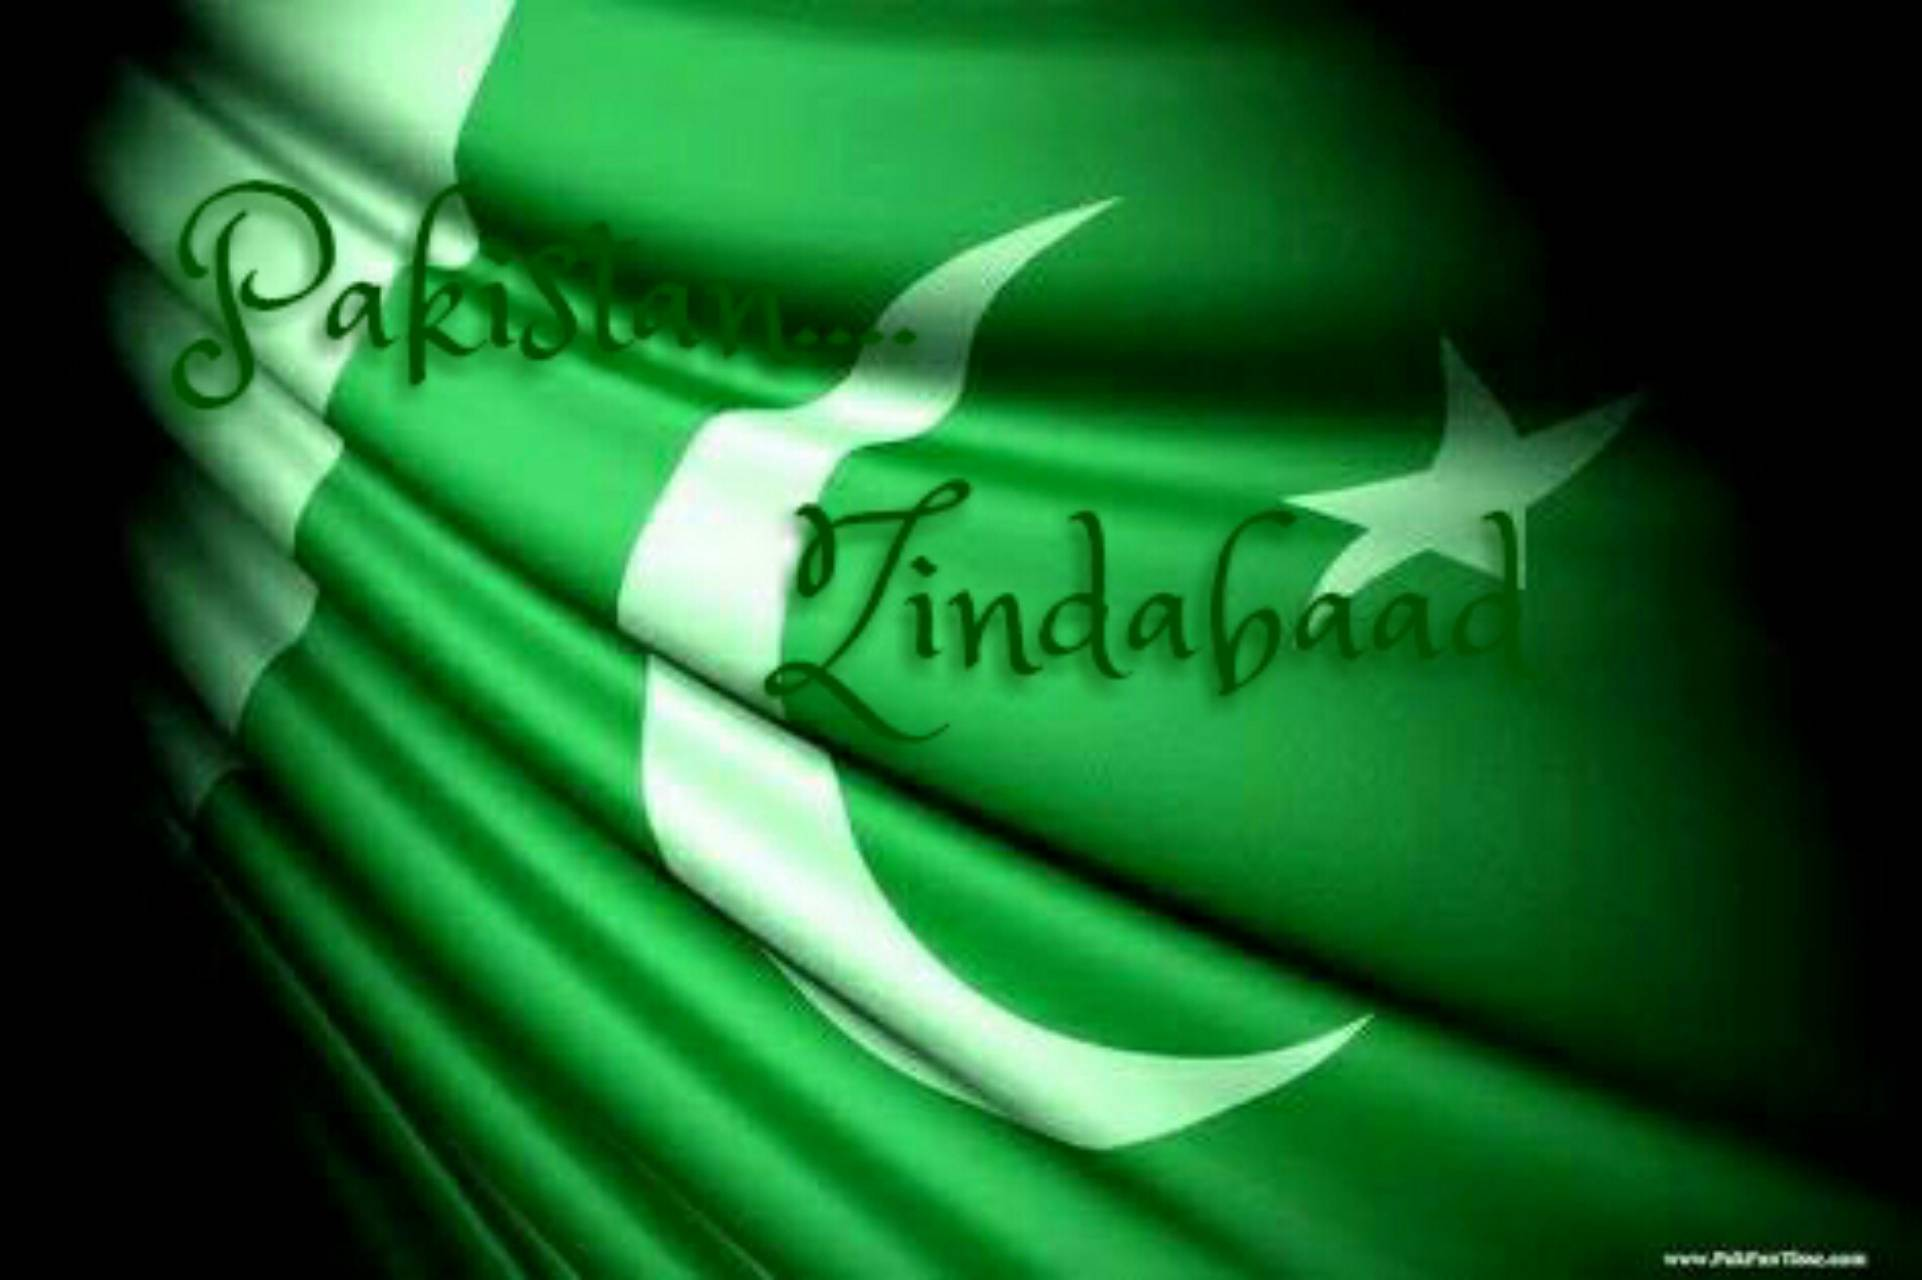 Pakistan Zindabaad